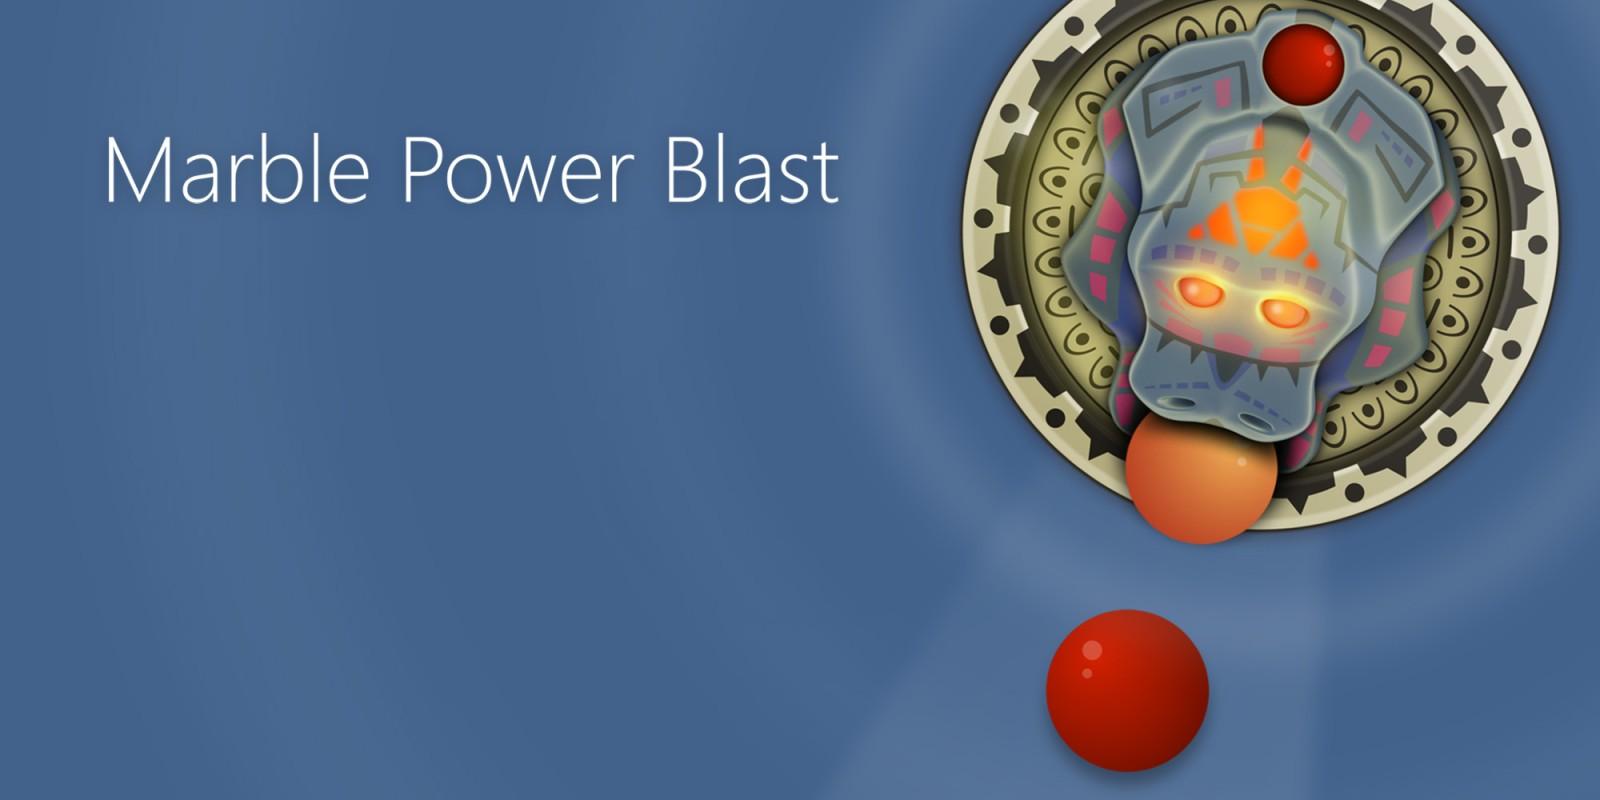 Marble Power Blast | Nintendo Switch download software